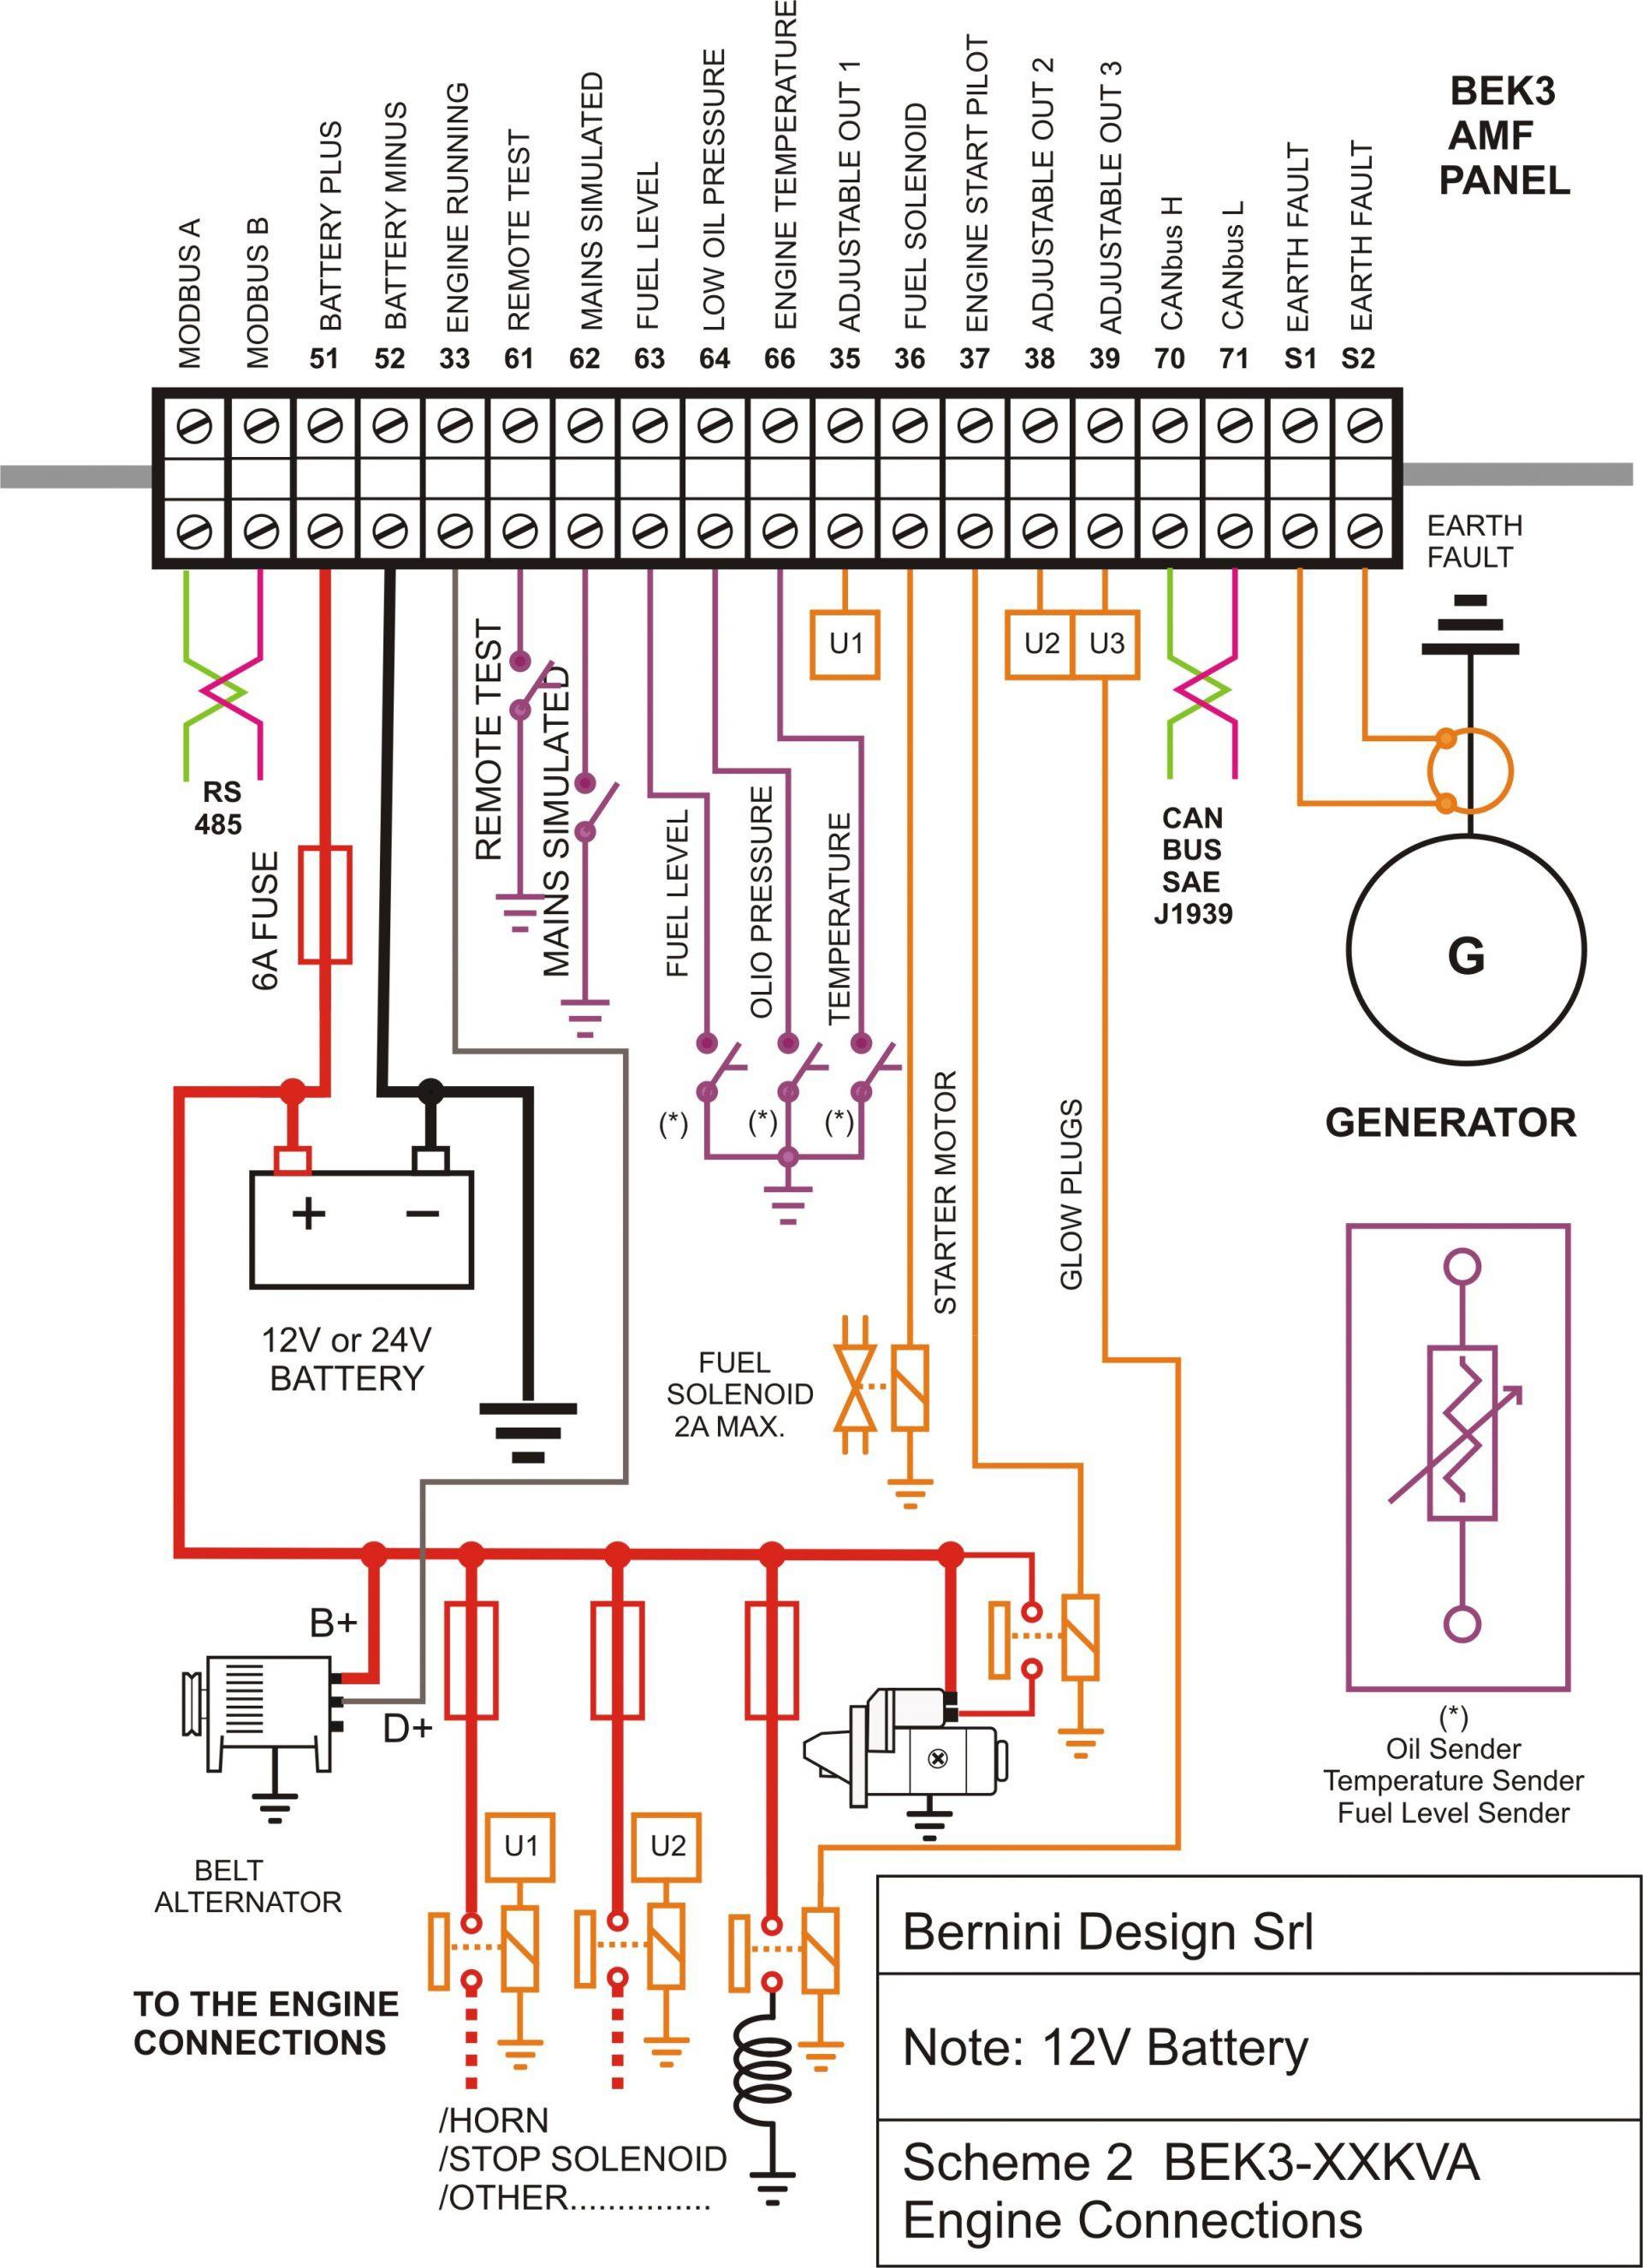 Cat C 12 Ecm Pin Wiring Diagram | Wiring Diagram - Cat 70 Pin Ecm Wiring Diagram